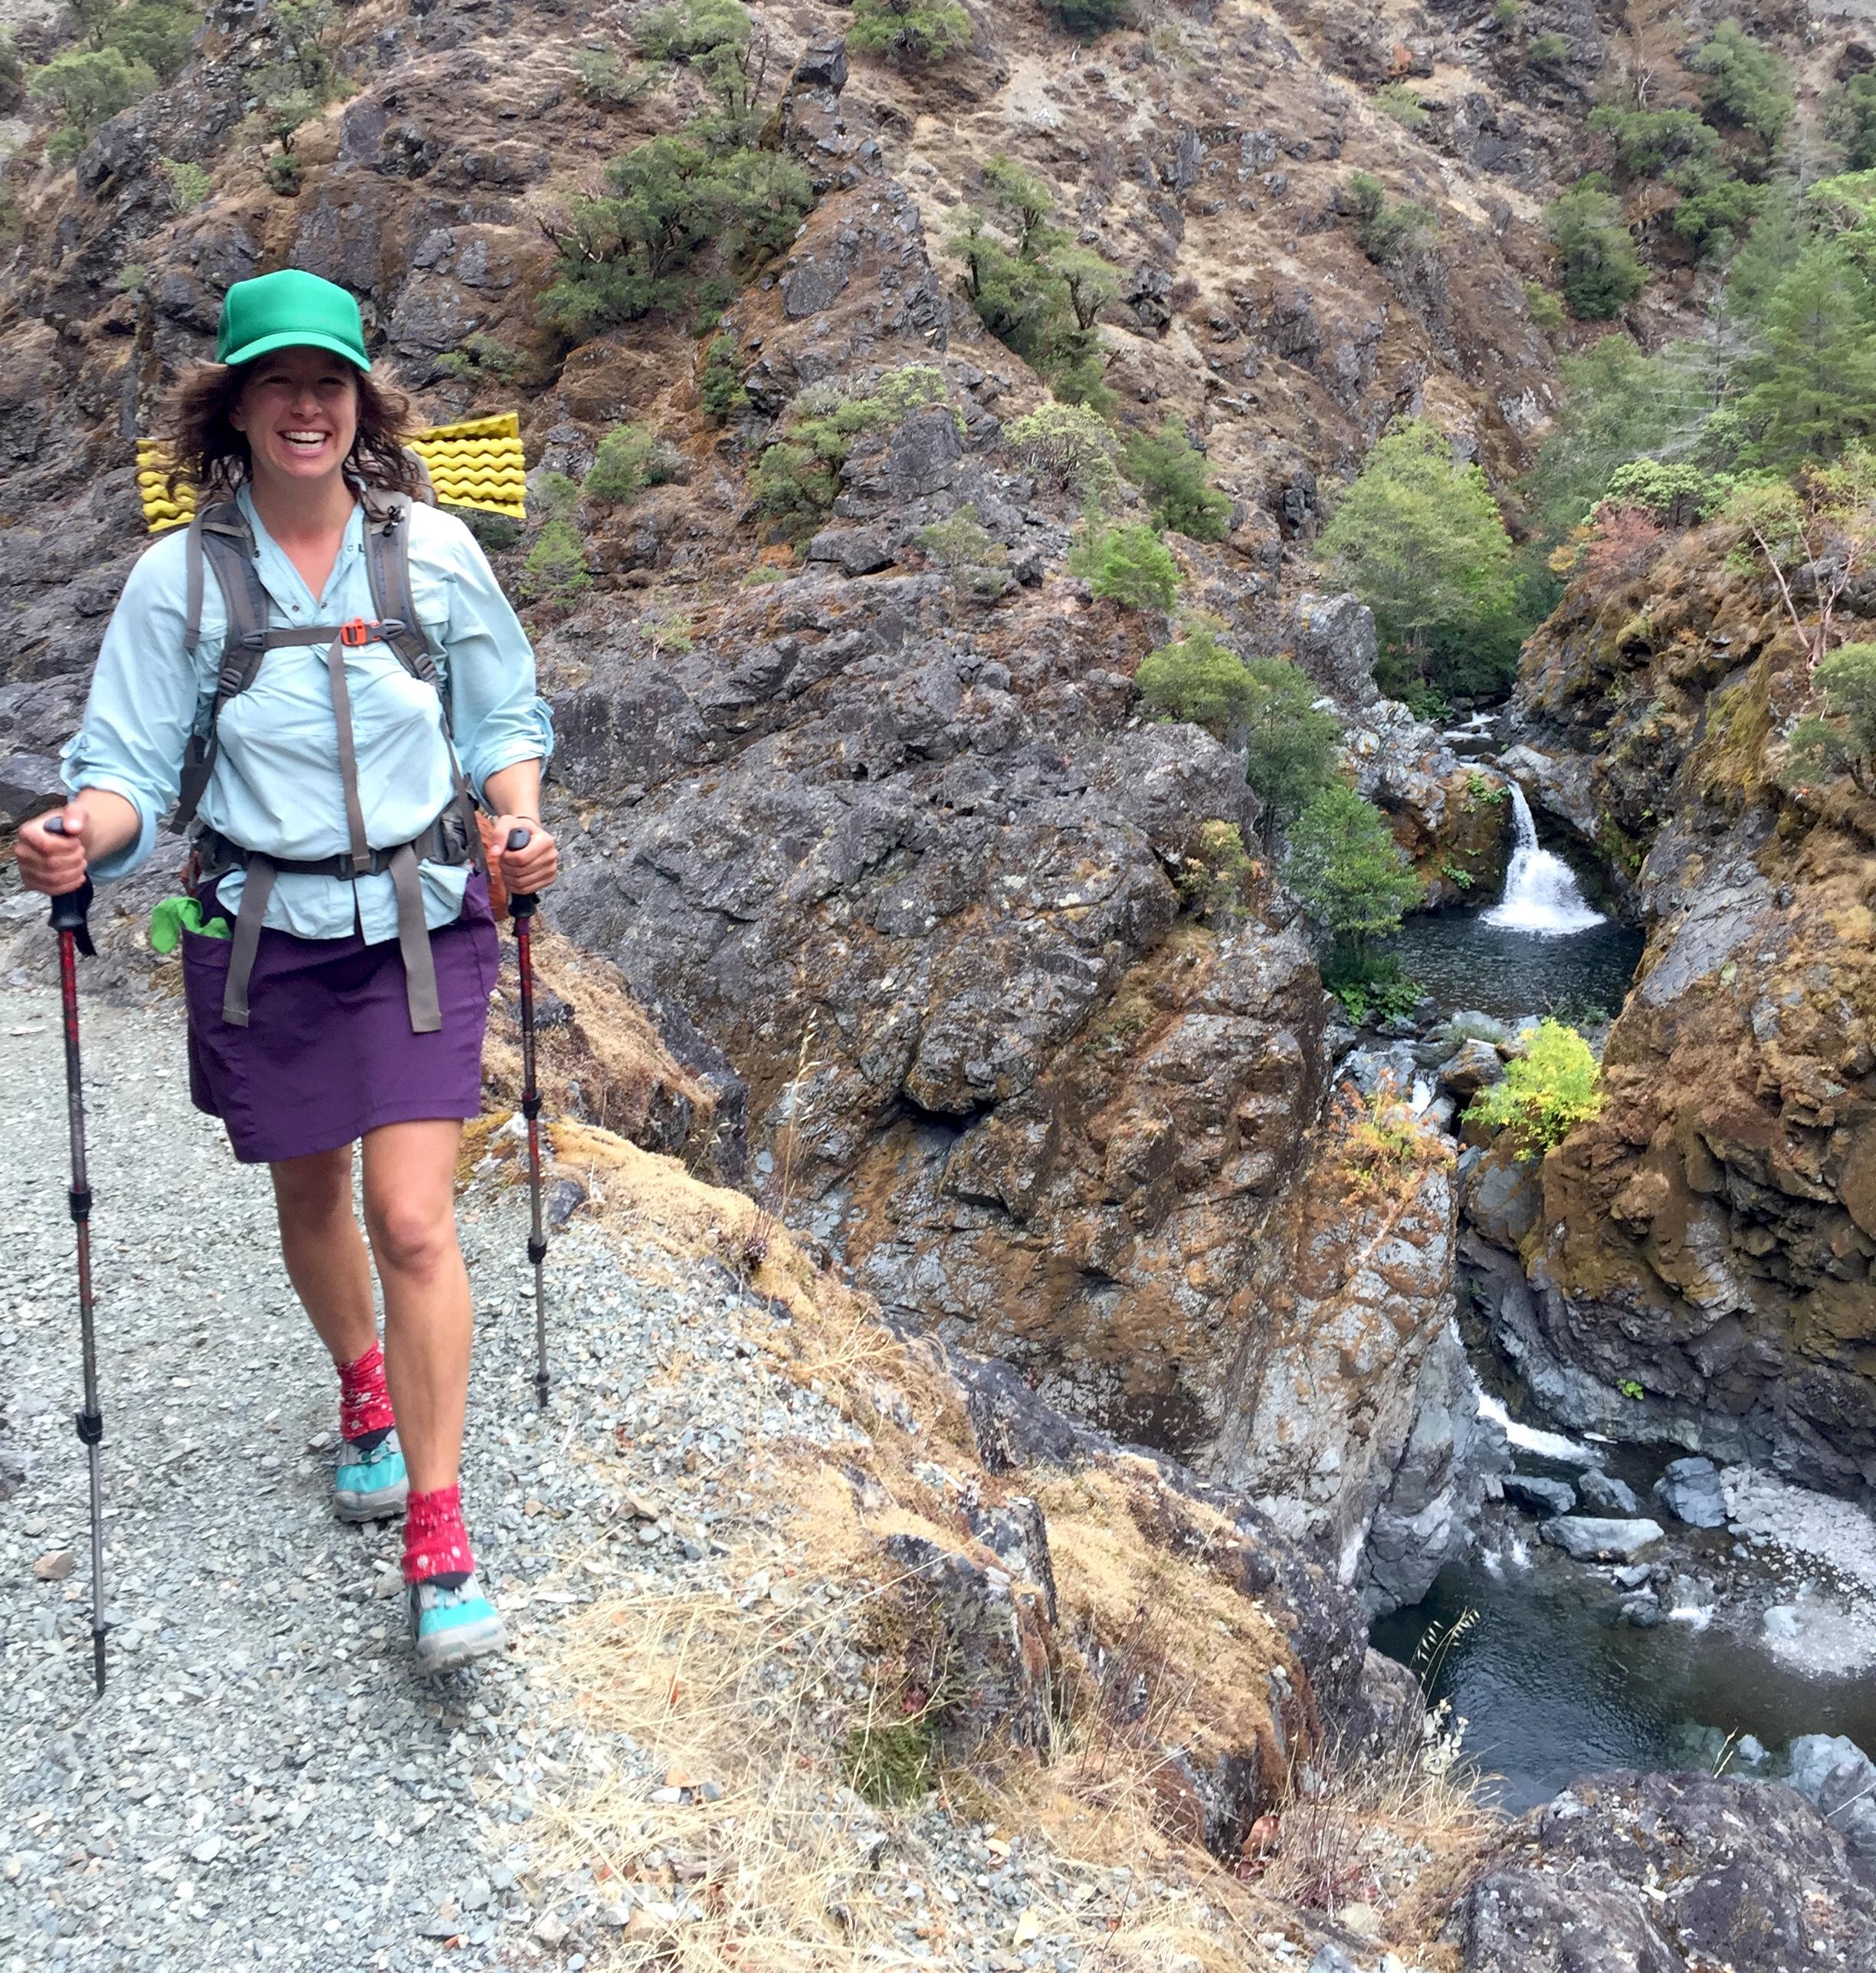 Purple Hiking Backpacking Skirt